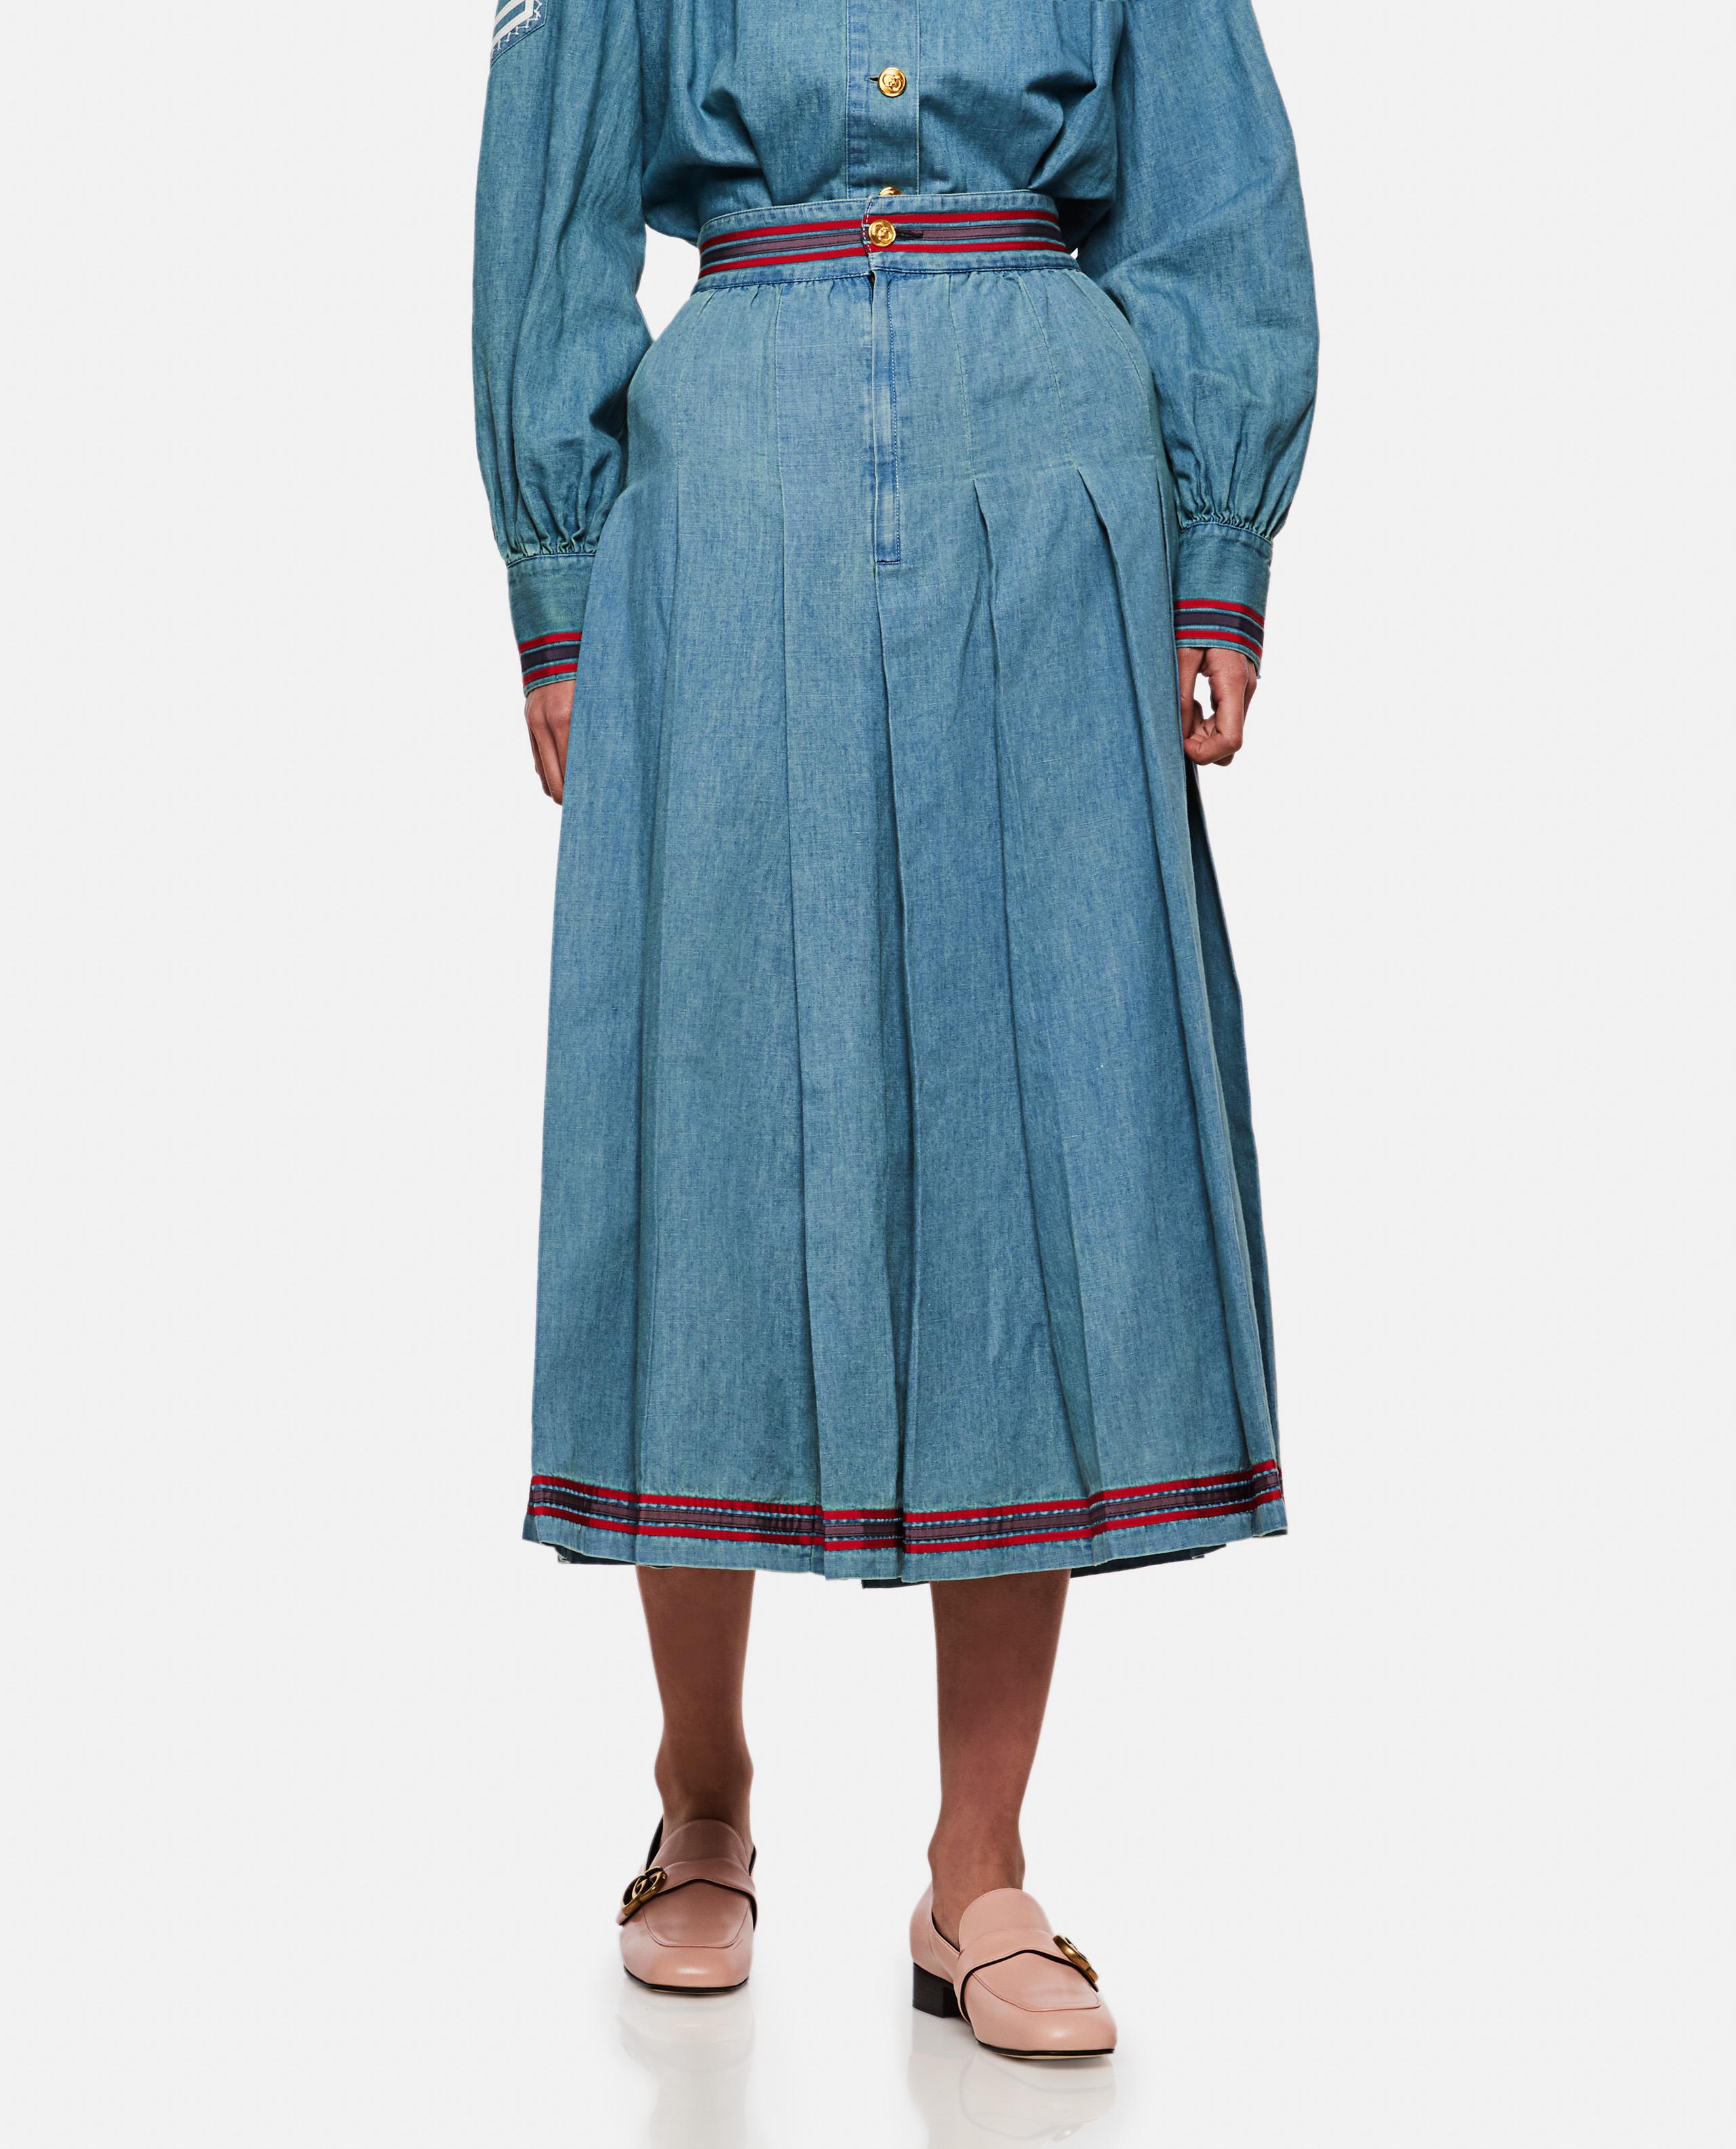 Distressed effect denim skirt